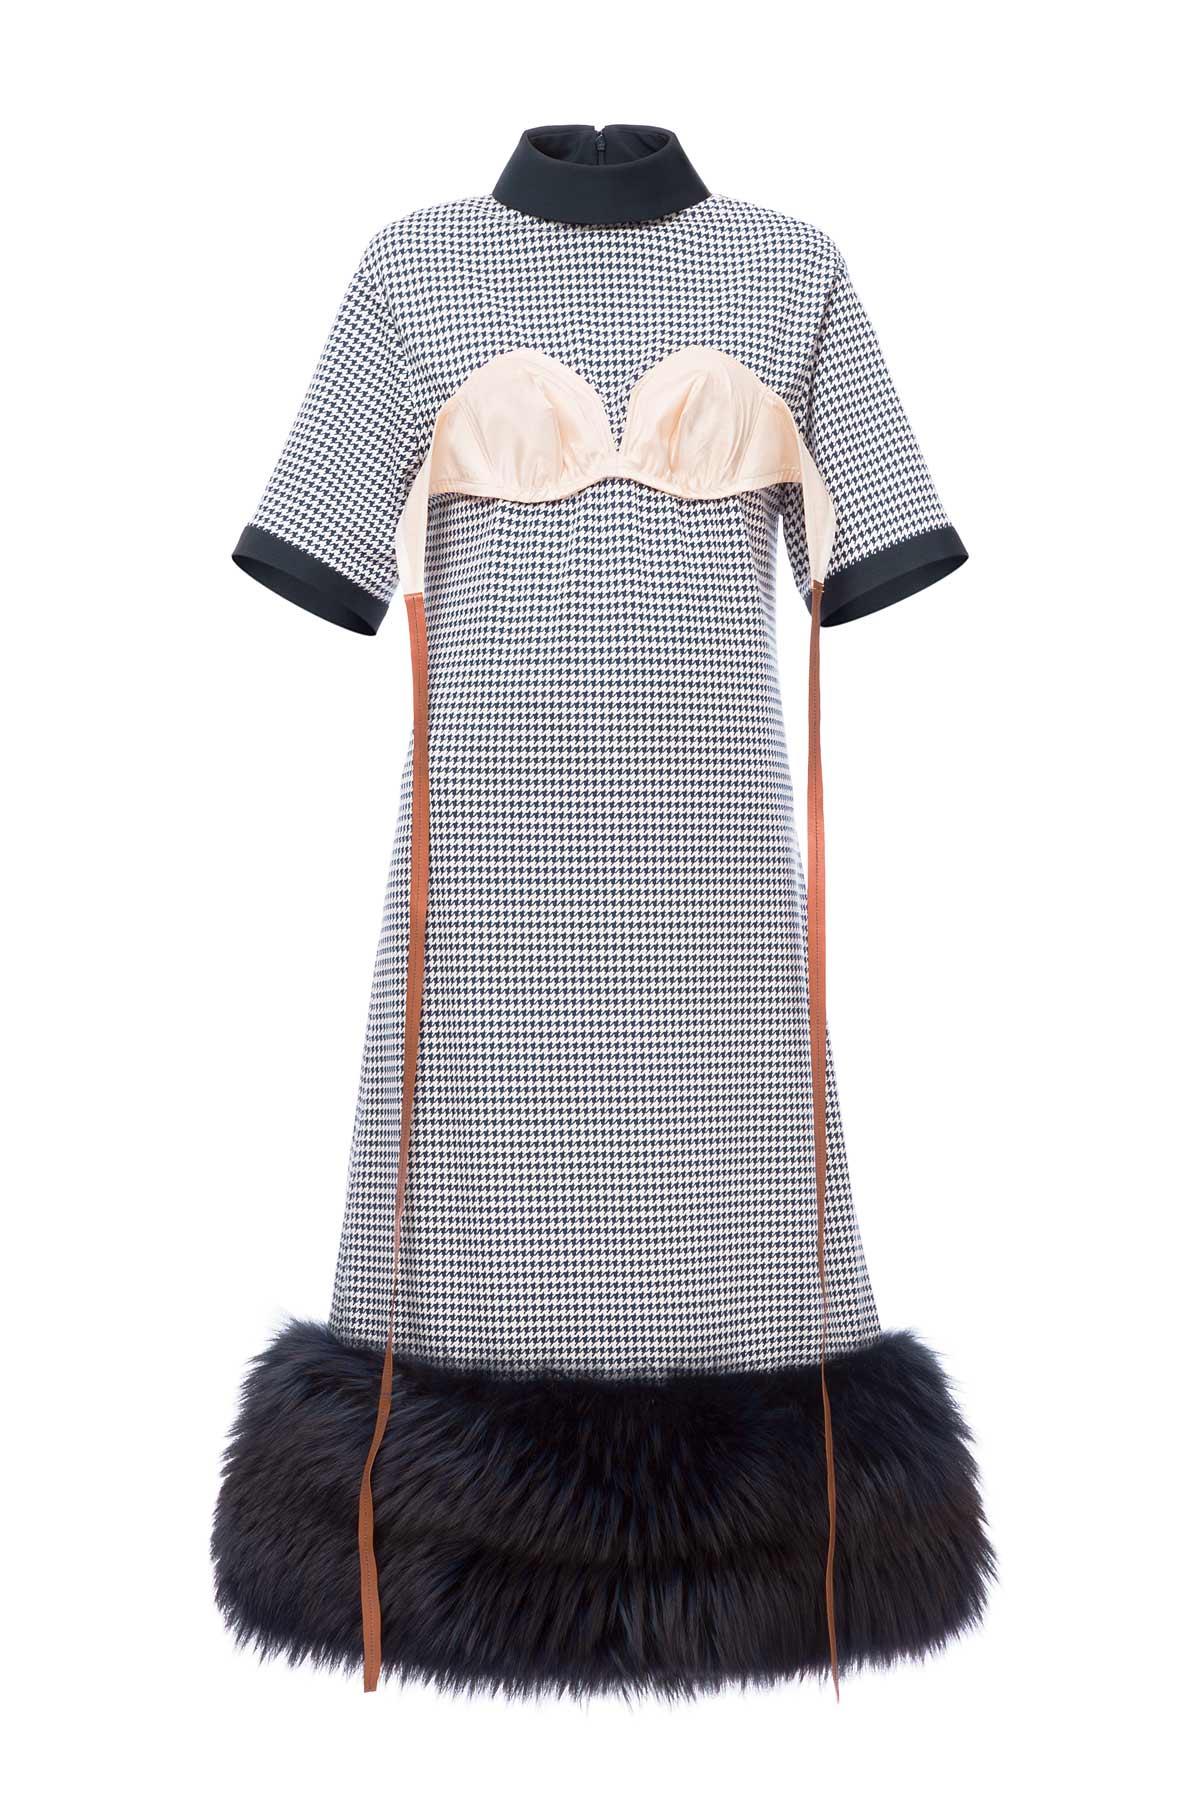 LOEWE Shearling Trim Bra Dress Navy/White front